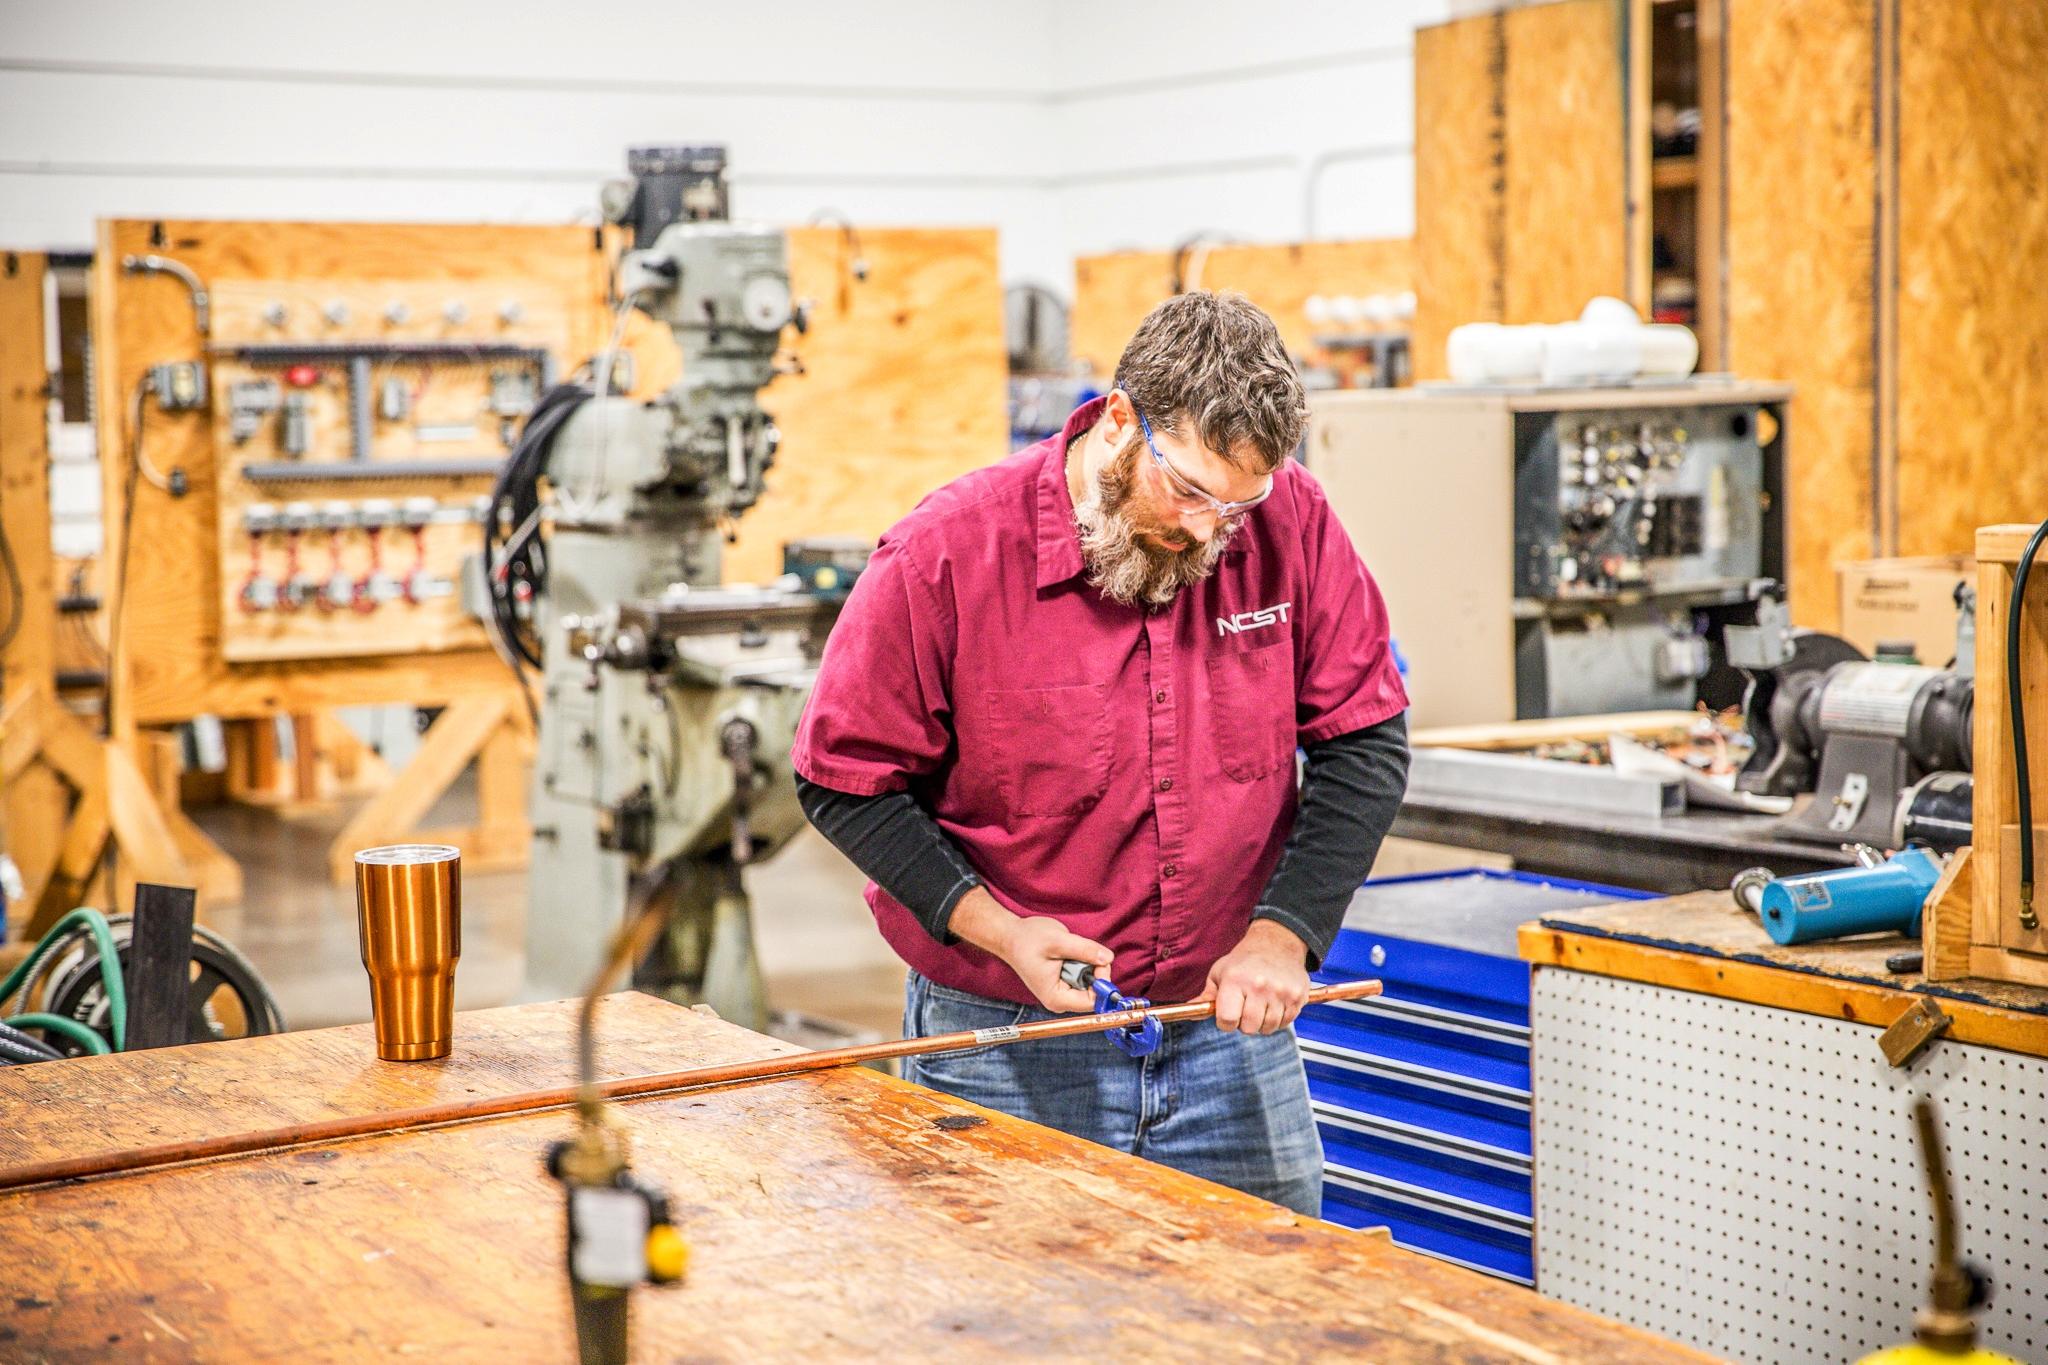 industrial maintenance programs | new castle school of trades